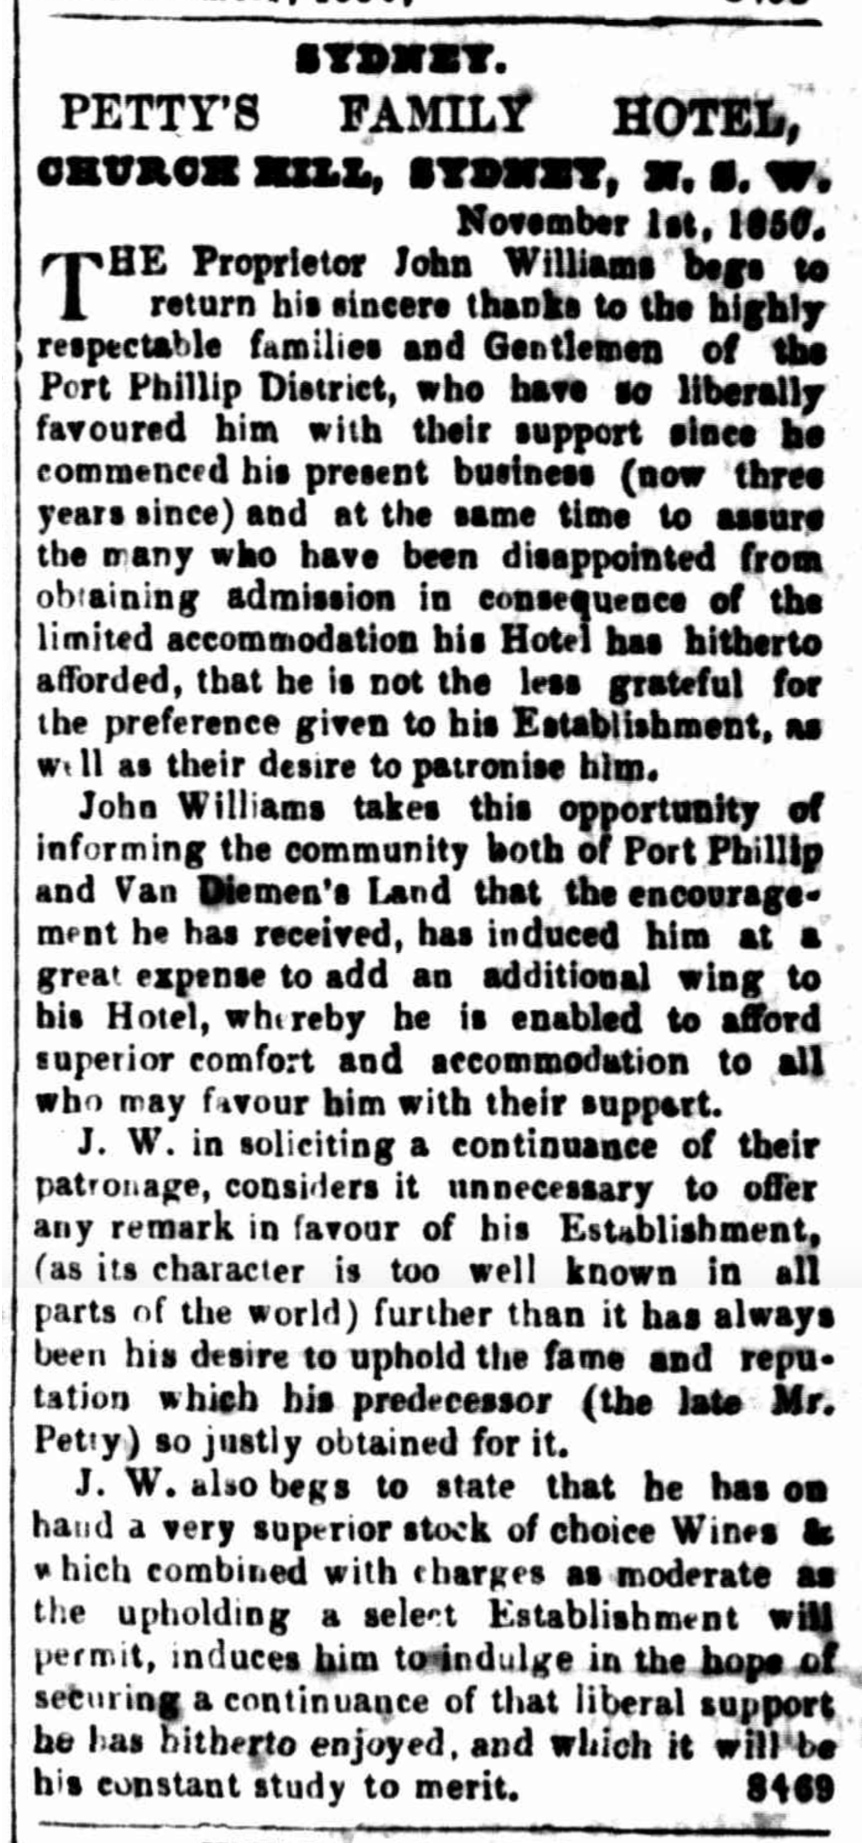 Petty's Family Hotel Advertisement, 1 November 1850